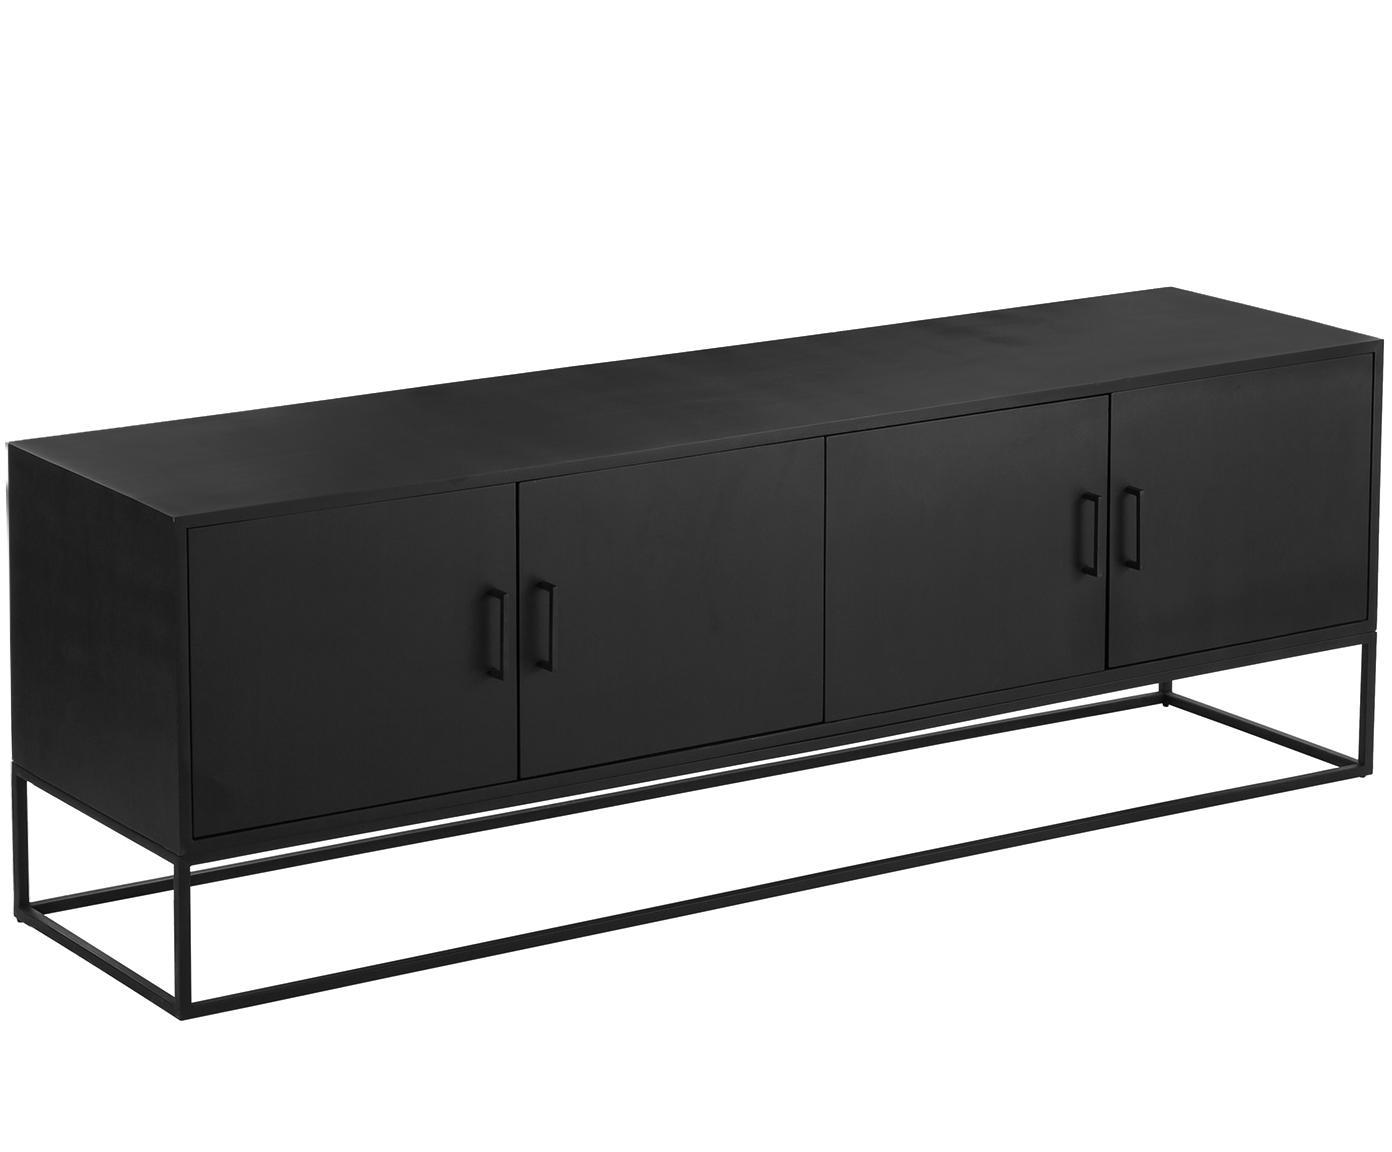 Lowboard Lyle mit Türen aus Massivholz, Korpus: Massives Mangoholz, lacki, Mangoholz, schwarz lackiert, 180 x 60 cm